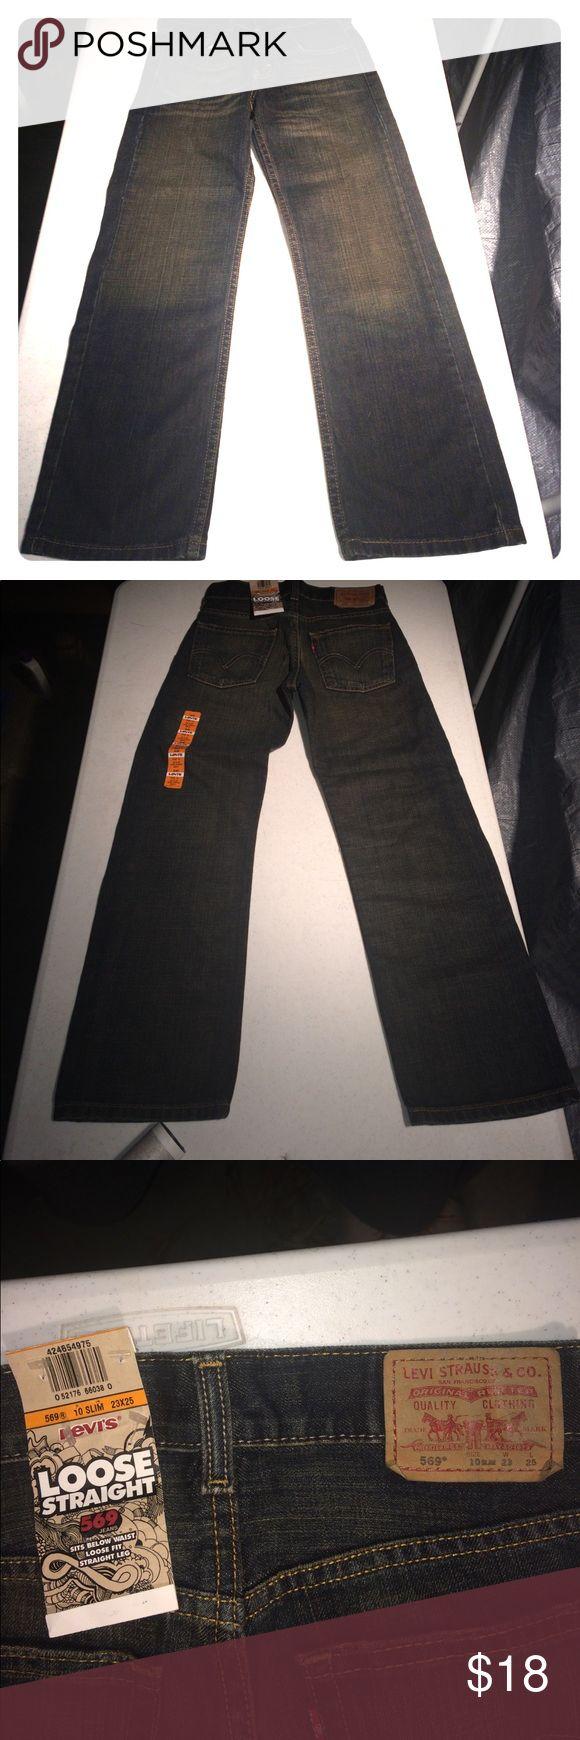 Selling this Levis 569 loose straight leg 10 slim new tags on Poshmark! My username is: micksattic. #shopmycloset #poshmark #fashion #shopping #style #forsale #Levis #Other